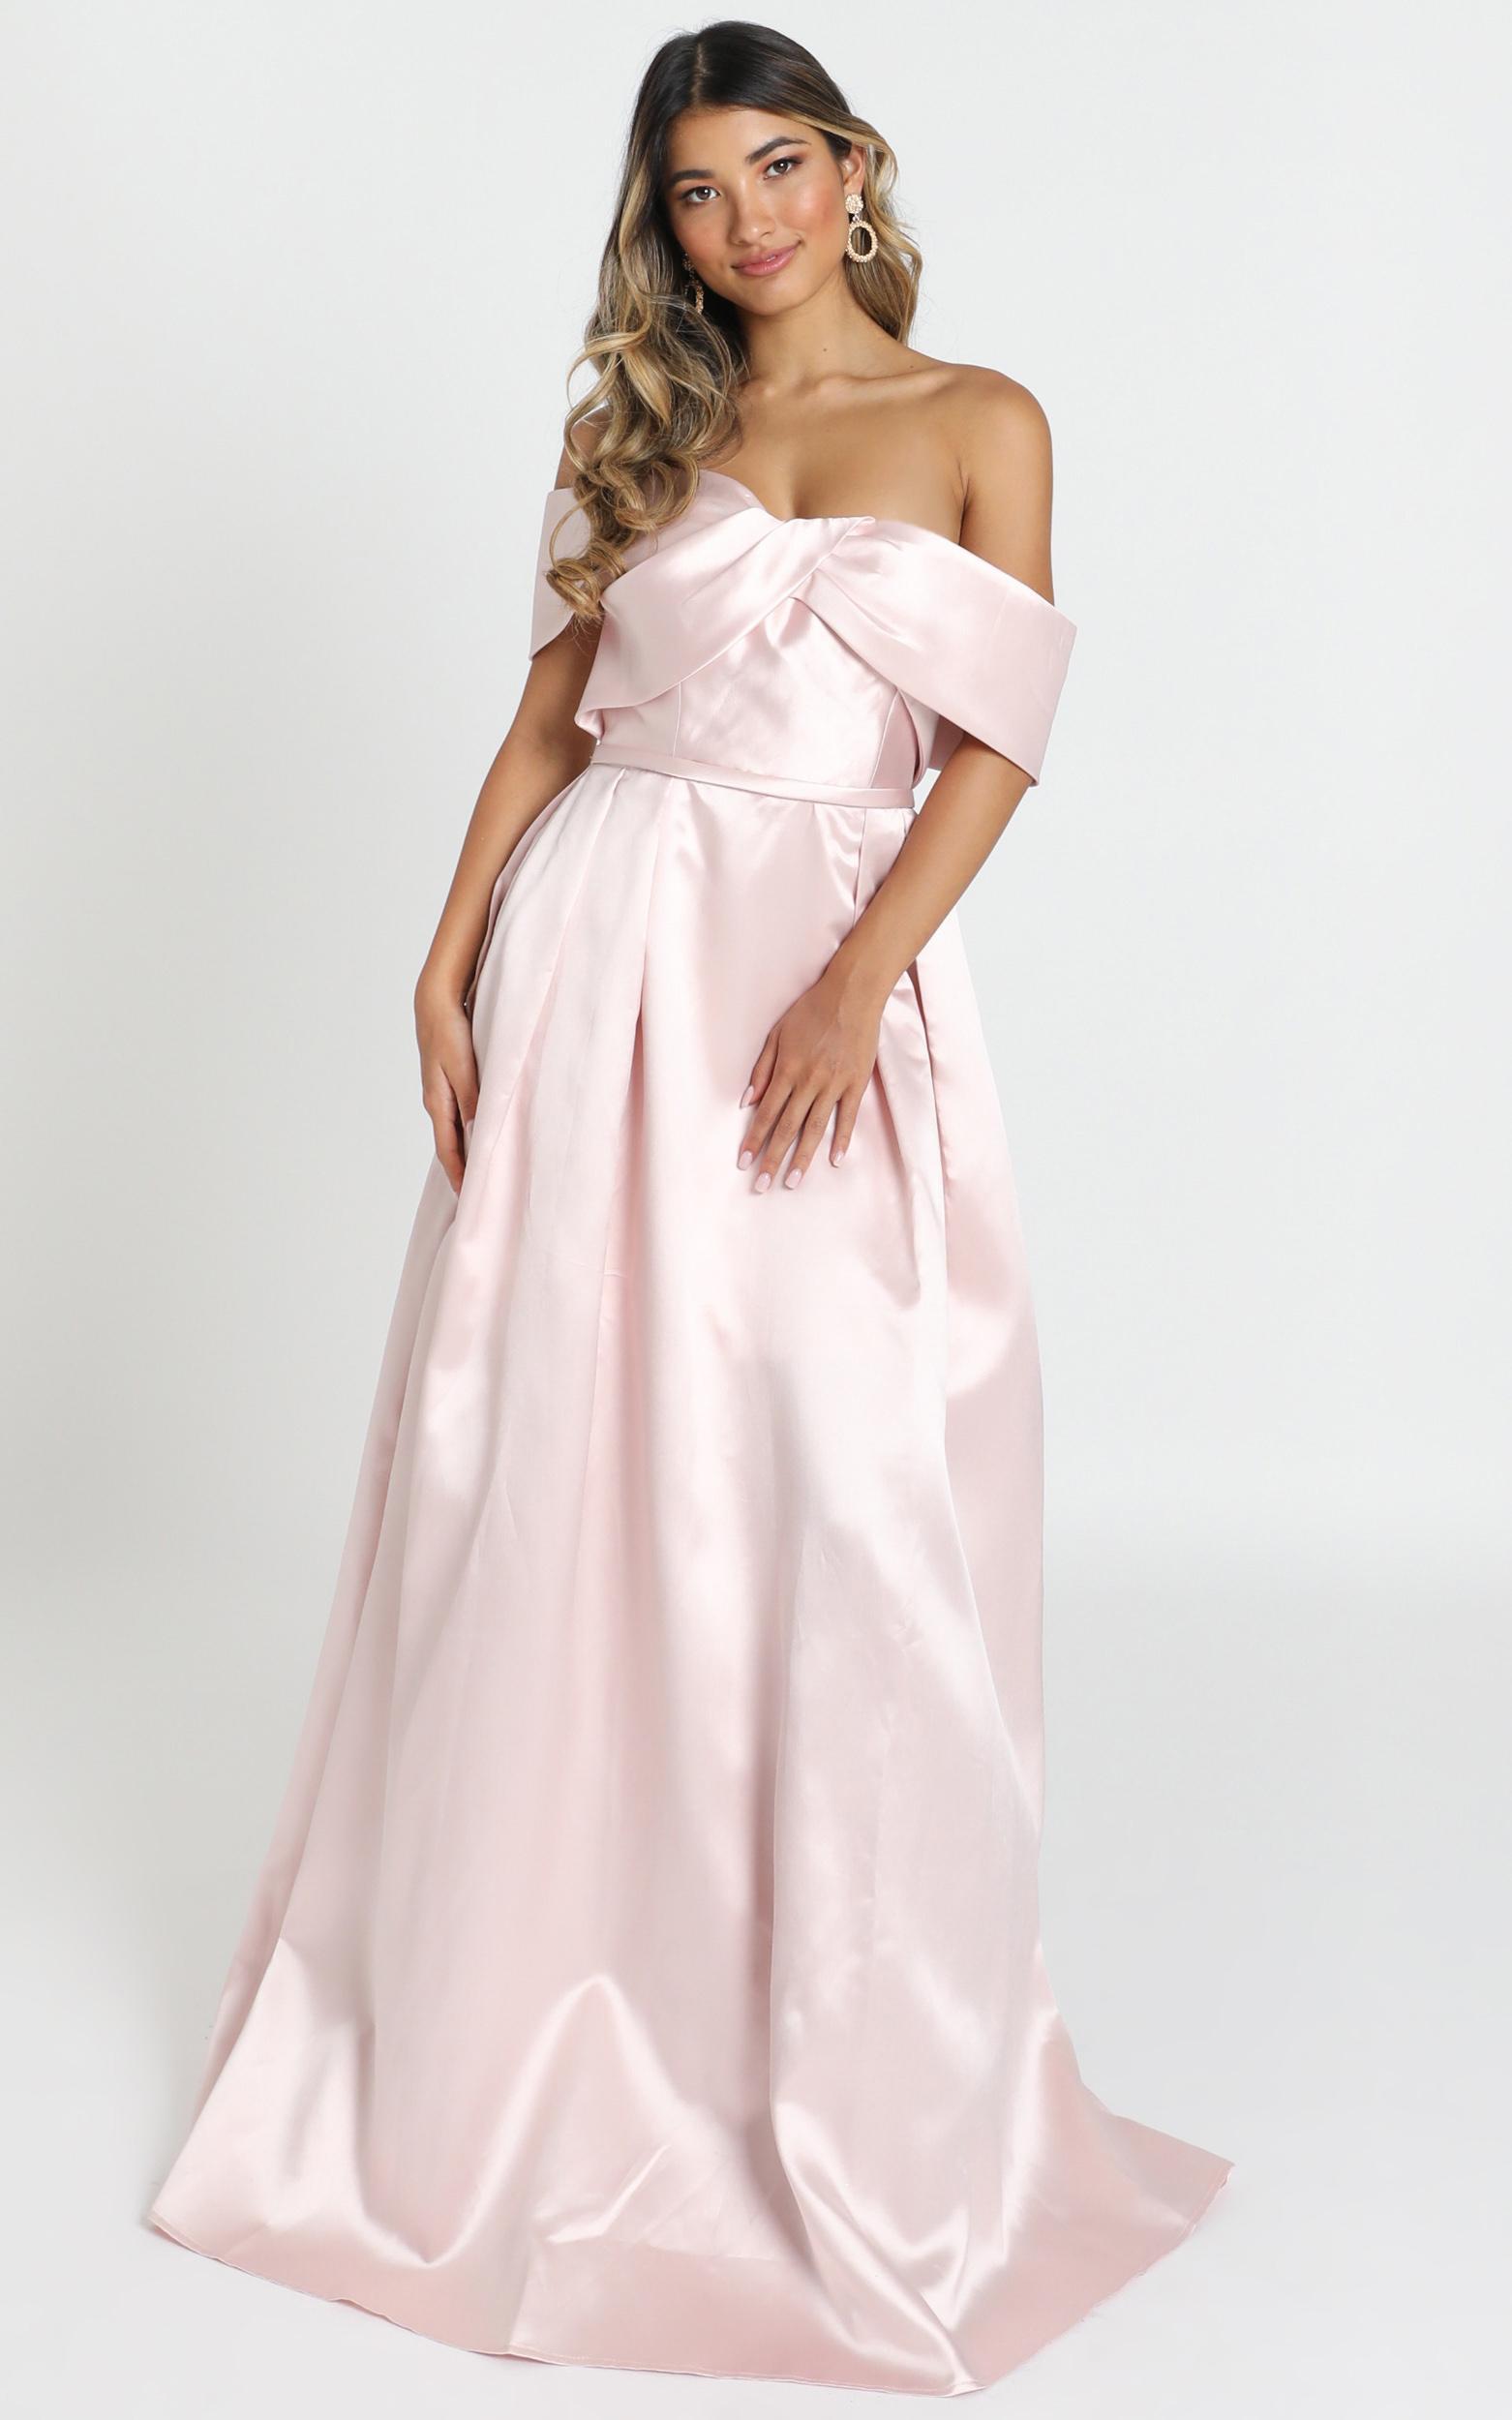 Alfreda Maxi Dress in blush satin - 8 (S), Blush, hi-res image number null